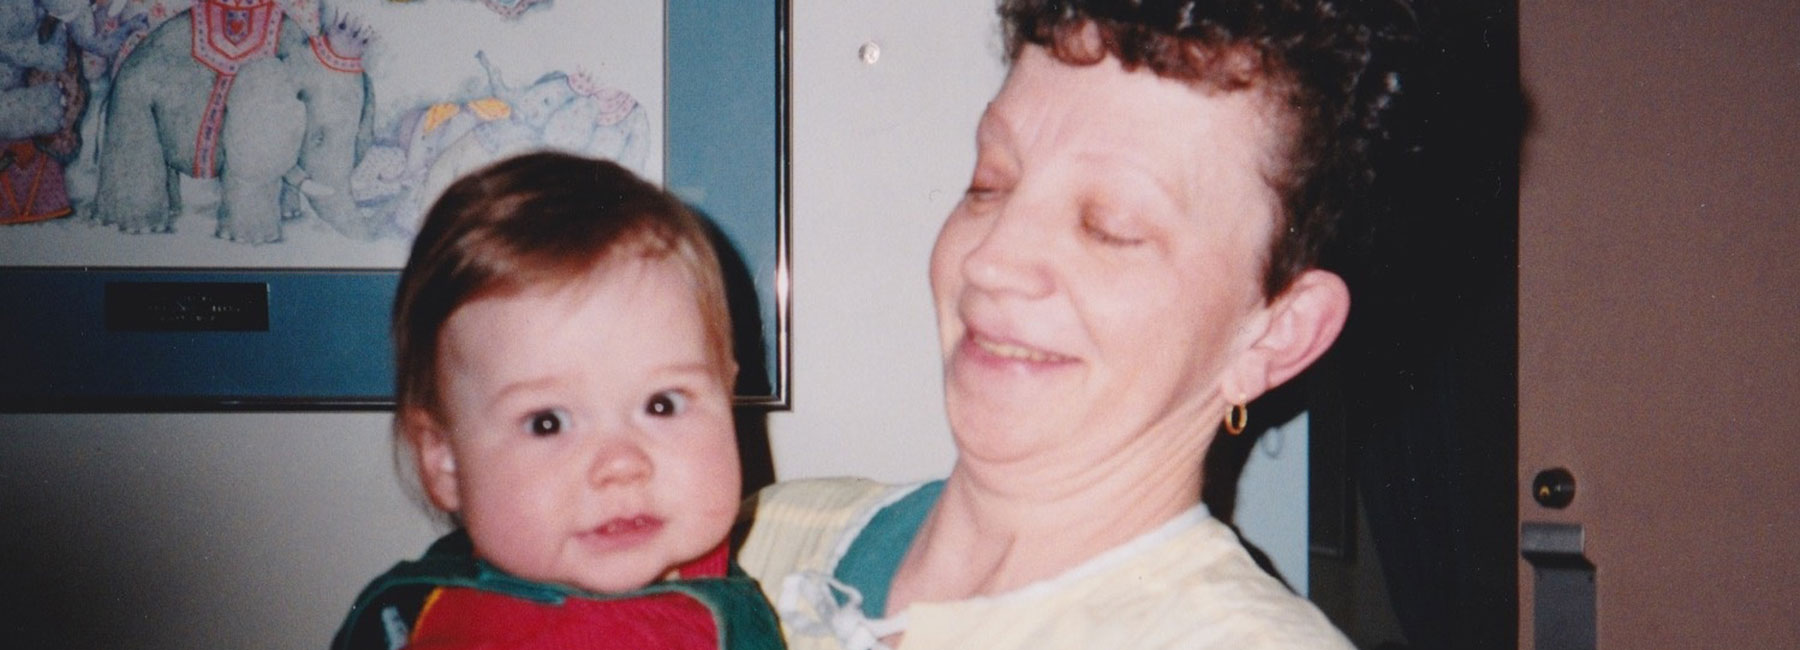 RMHF Receives Donation in Memorial of Long-Time LPN Joyce Kowalyk